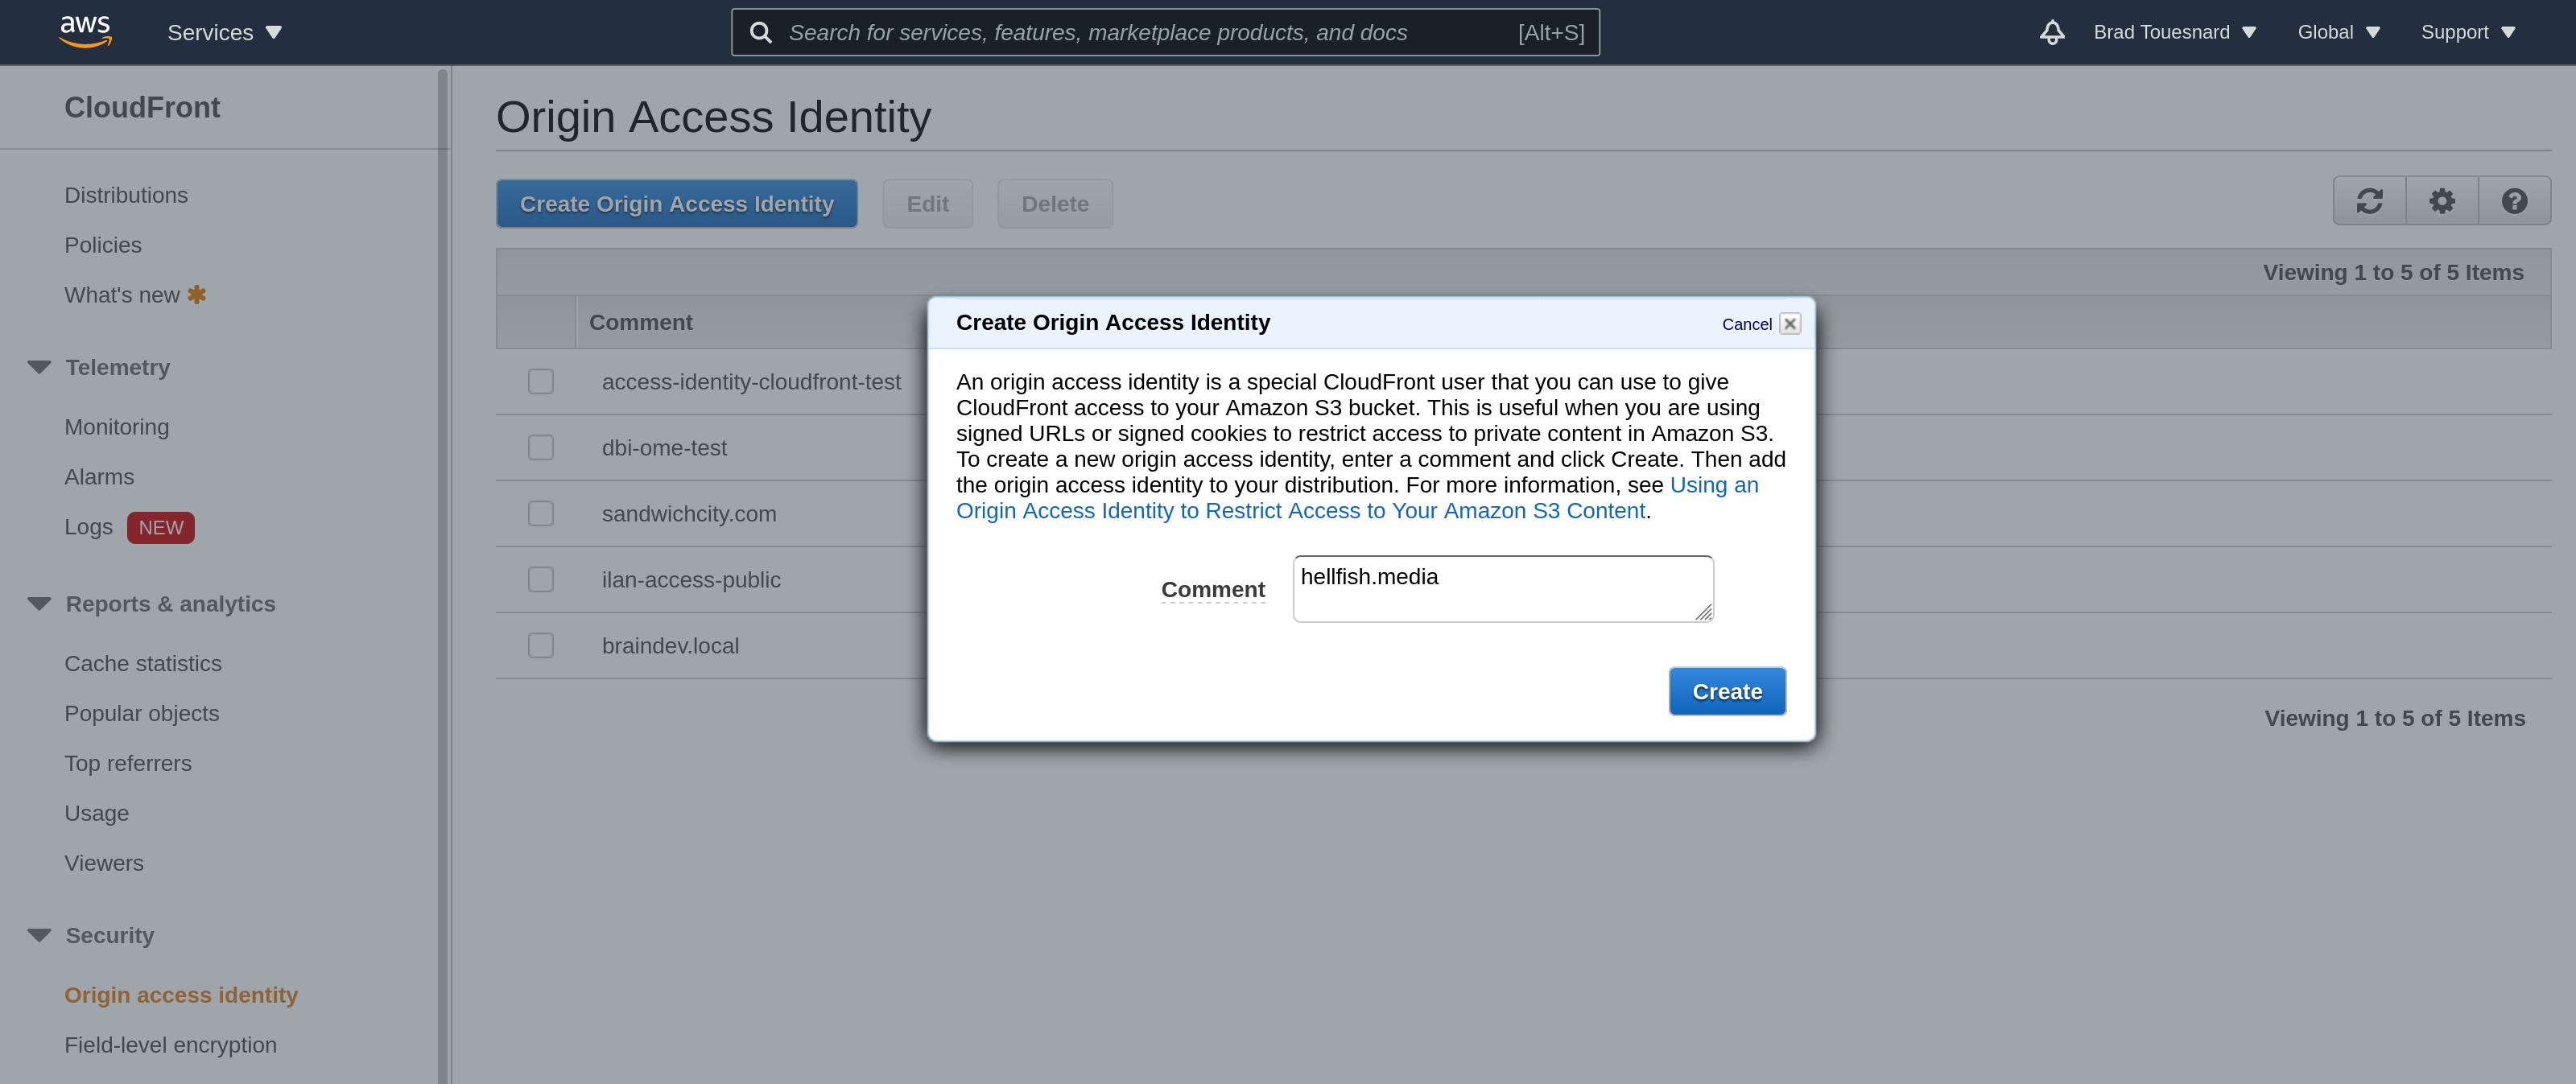 OME CloudFront Setup - Create Origin Access Identity dialog